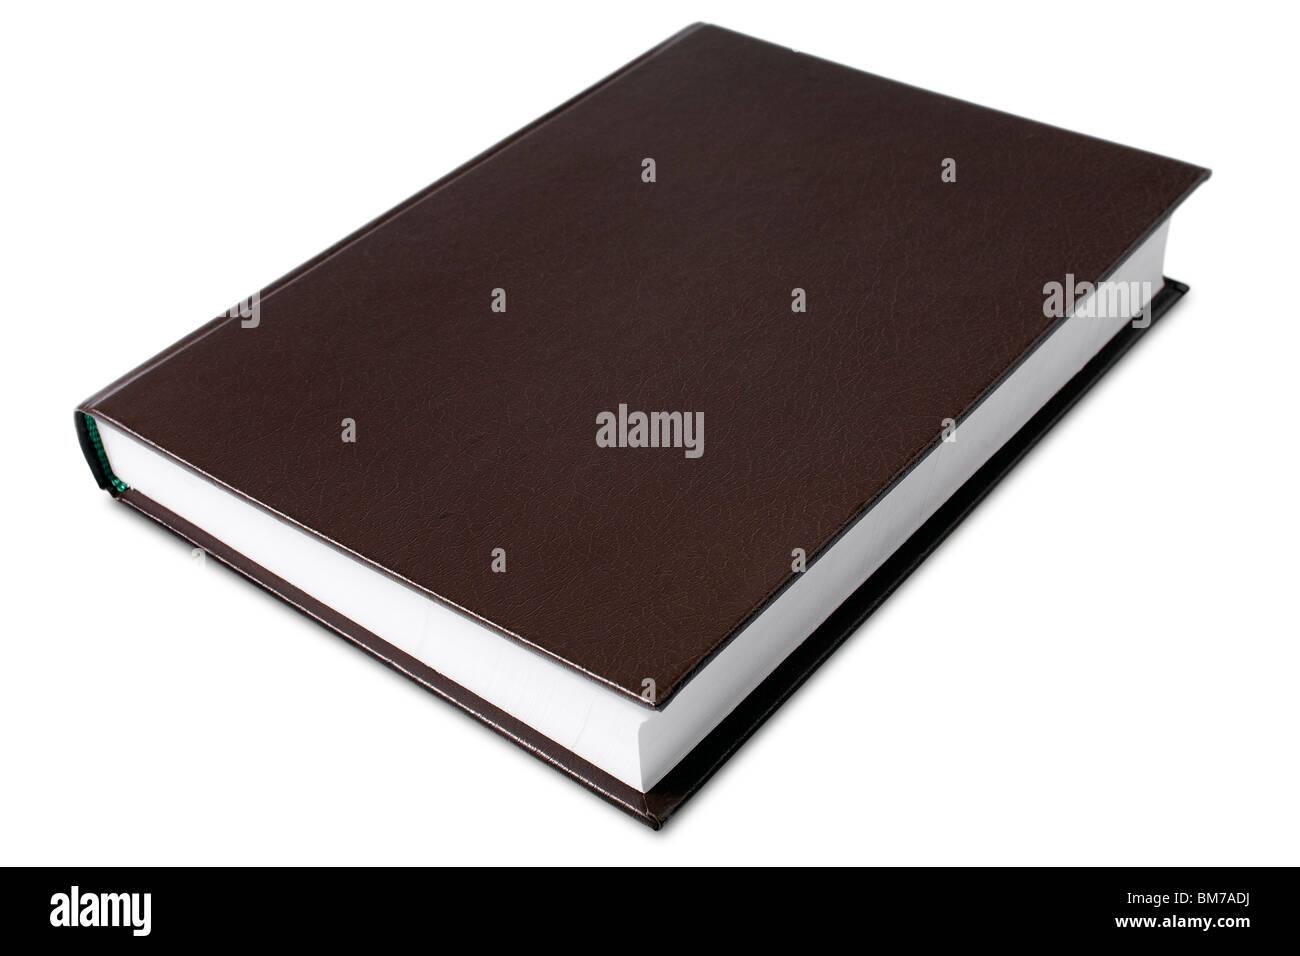 Un libro de tapa dura en blanco - con trazado de recorte Imagen De Stock